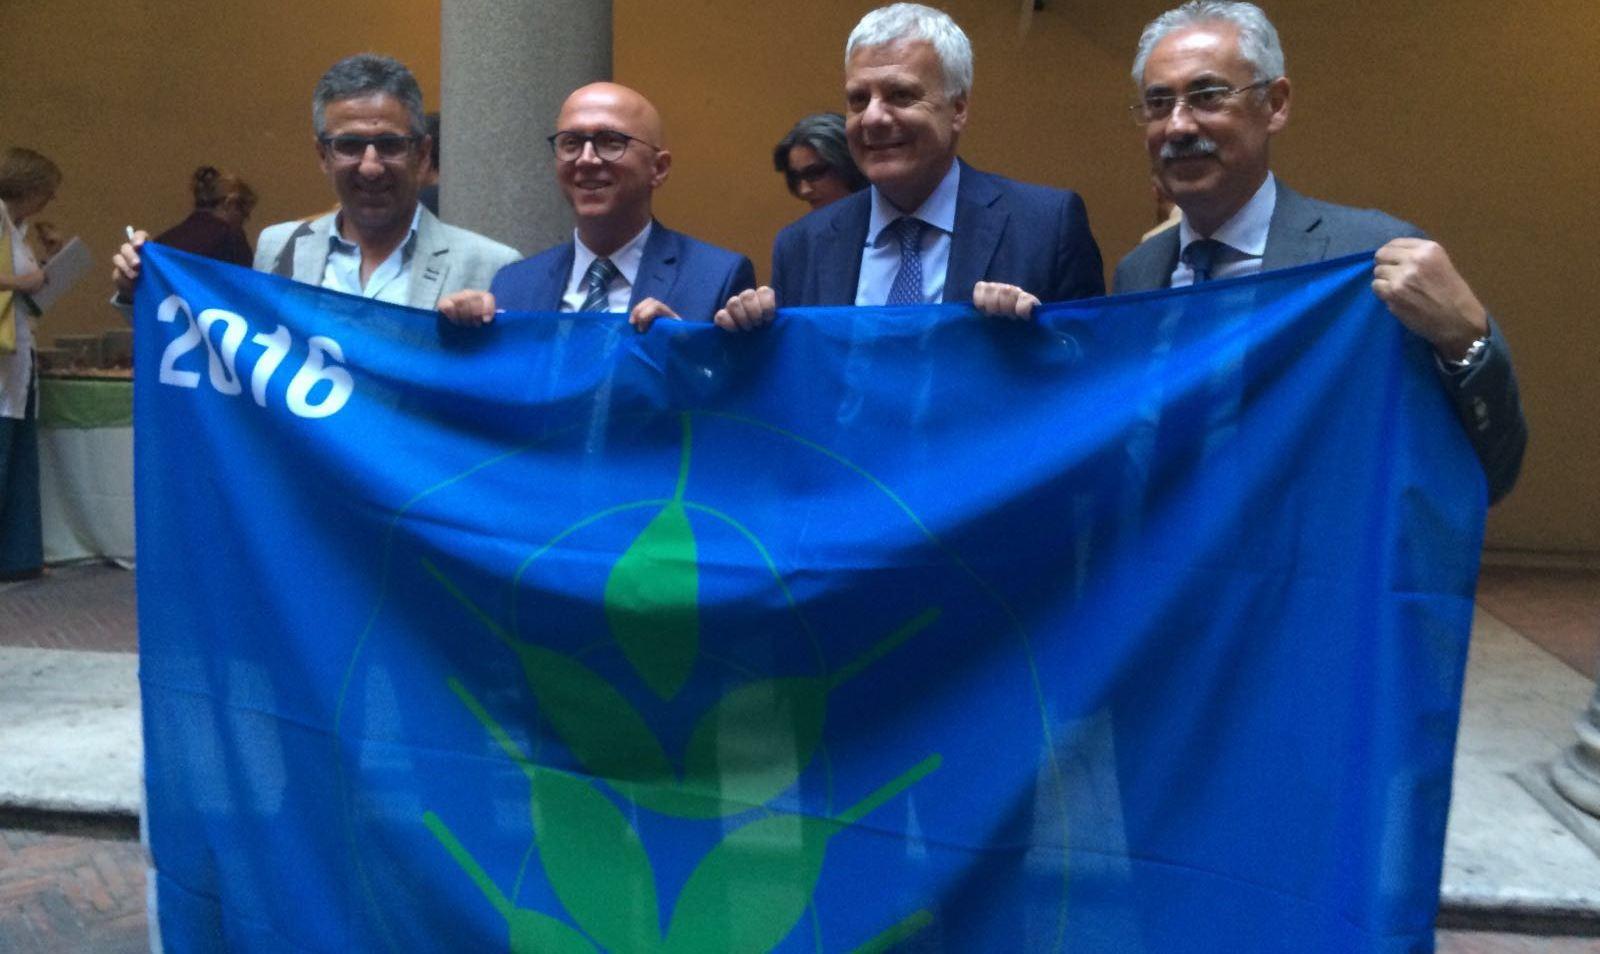 Turismo: Spighe Verdi a 13 comuni rurali da Confagricoltura e FEE